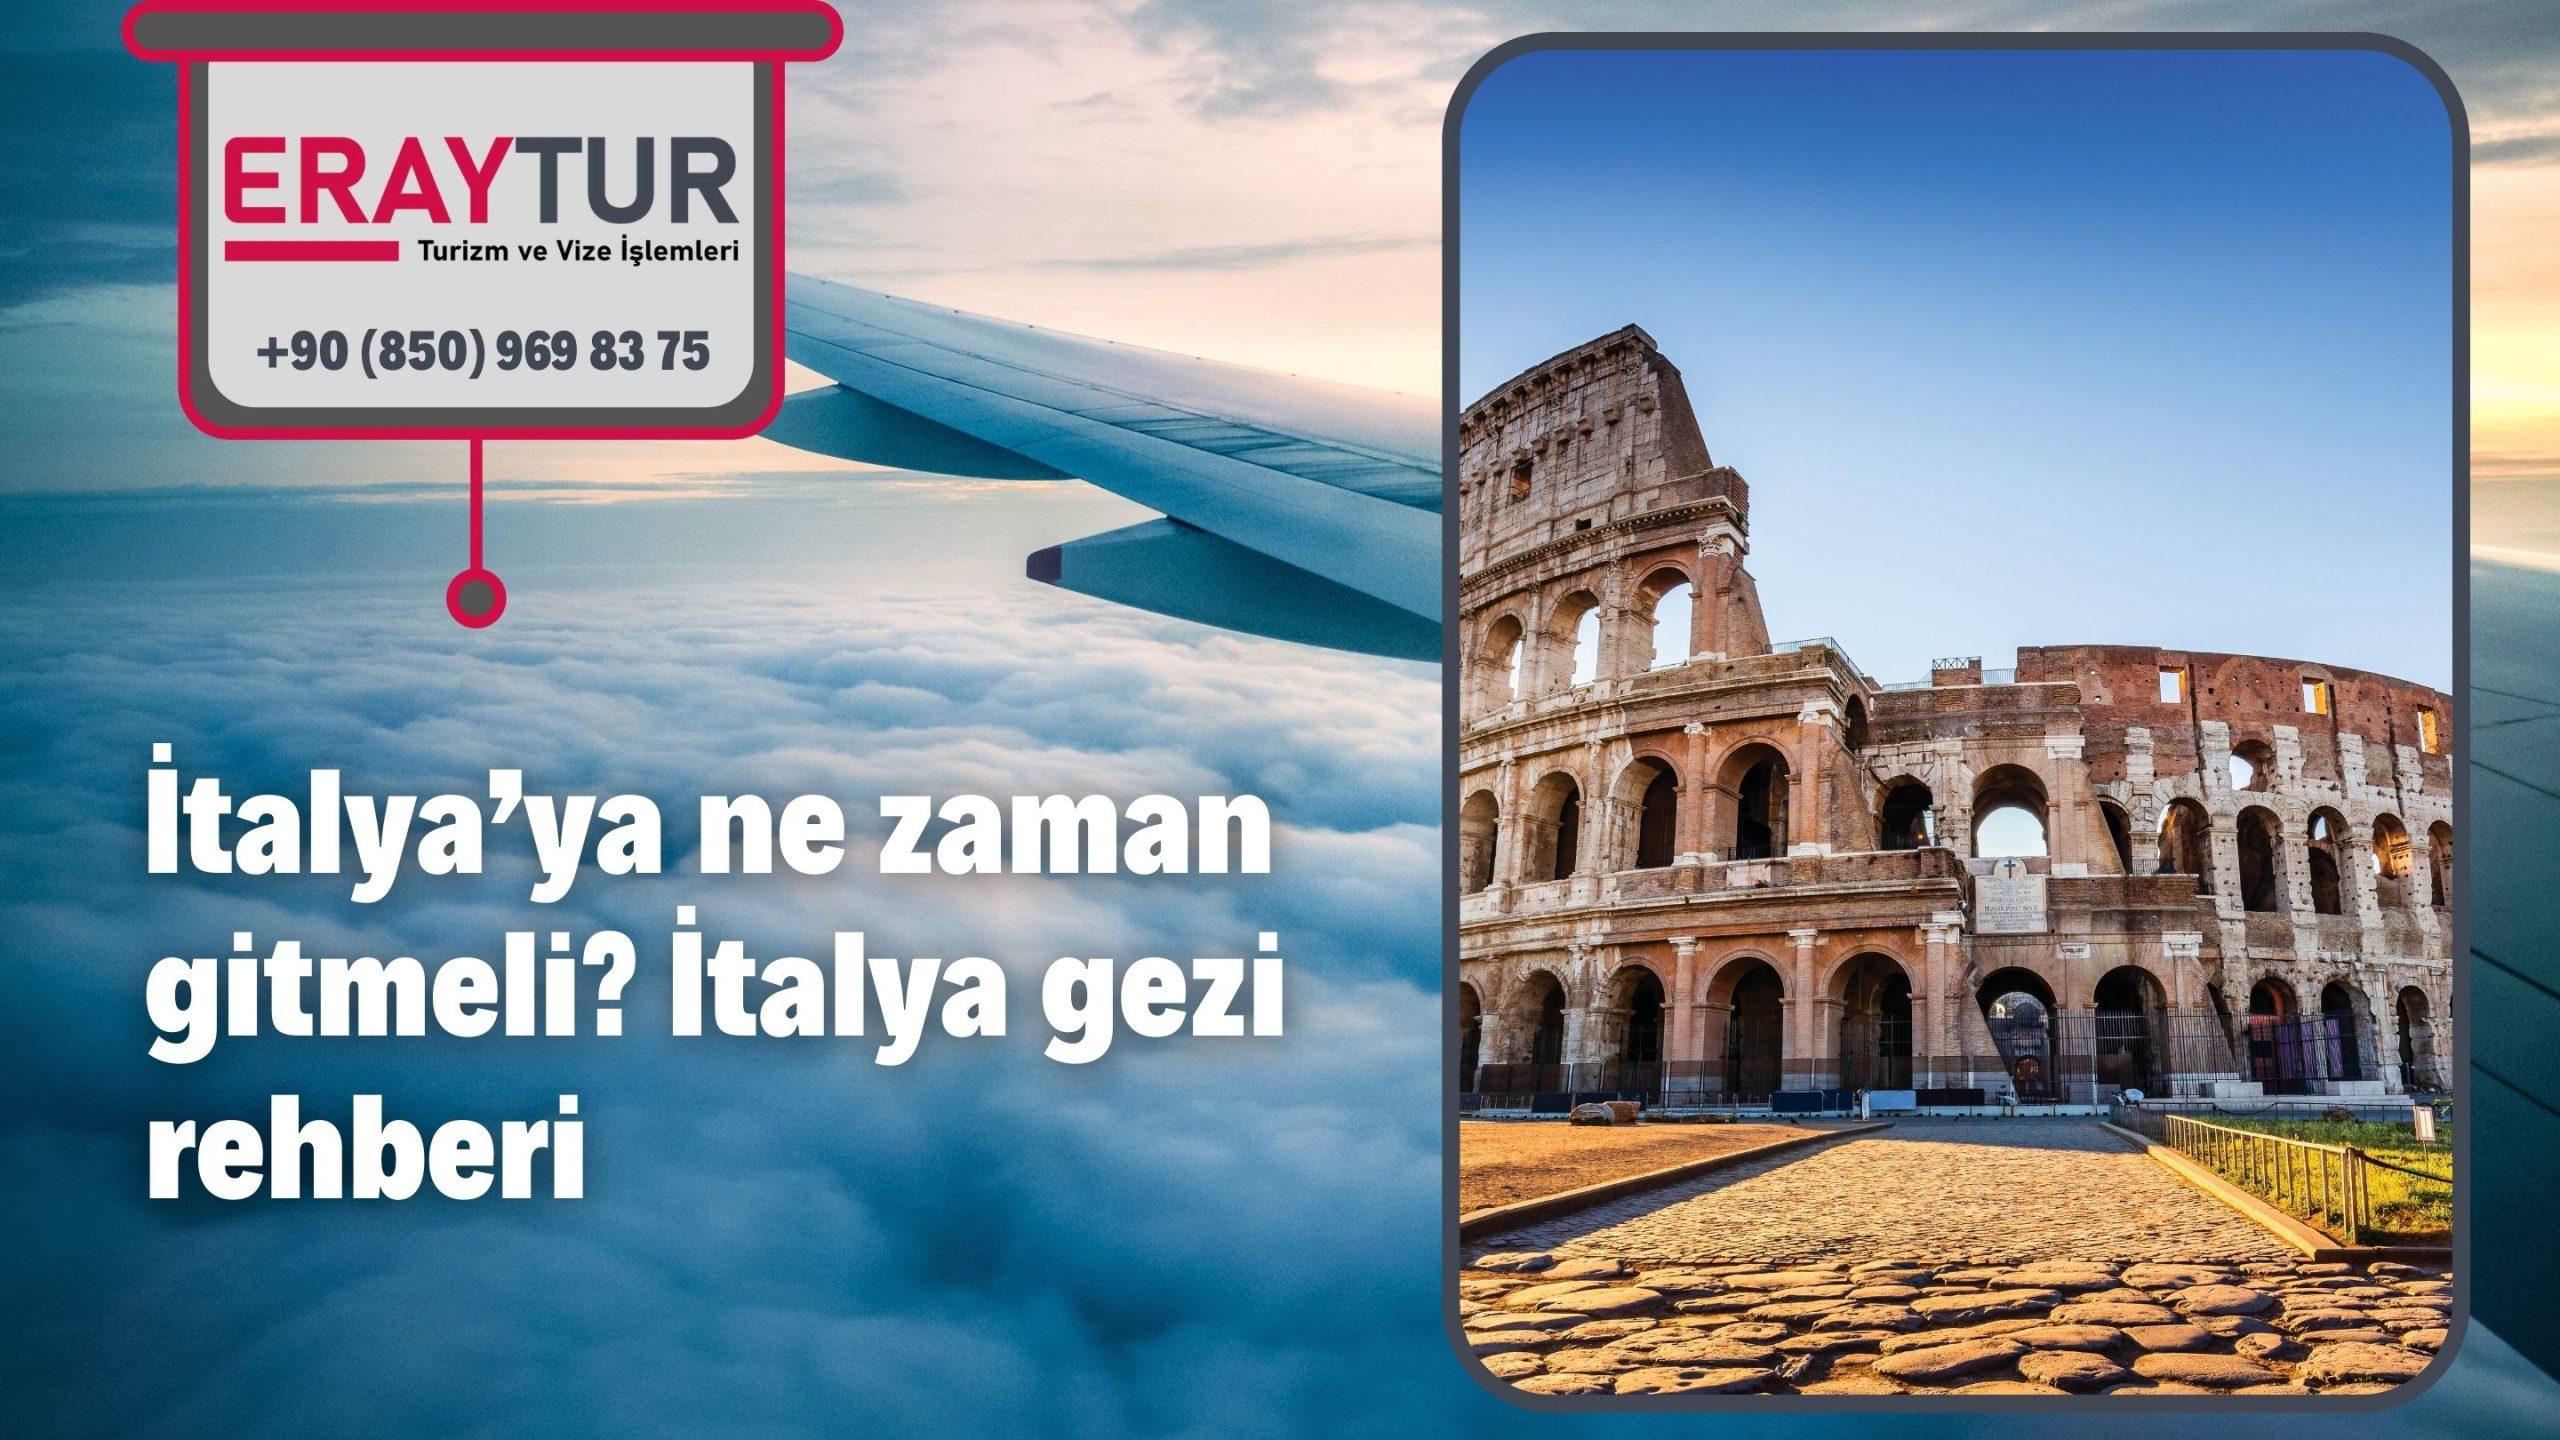 İtalya'ya ne zaman gitmeli? İtalya gezi rehberi-2021